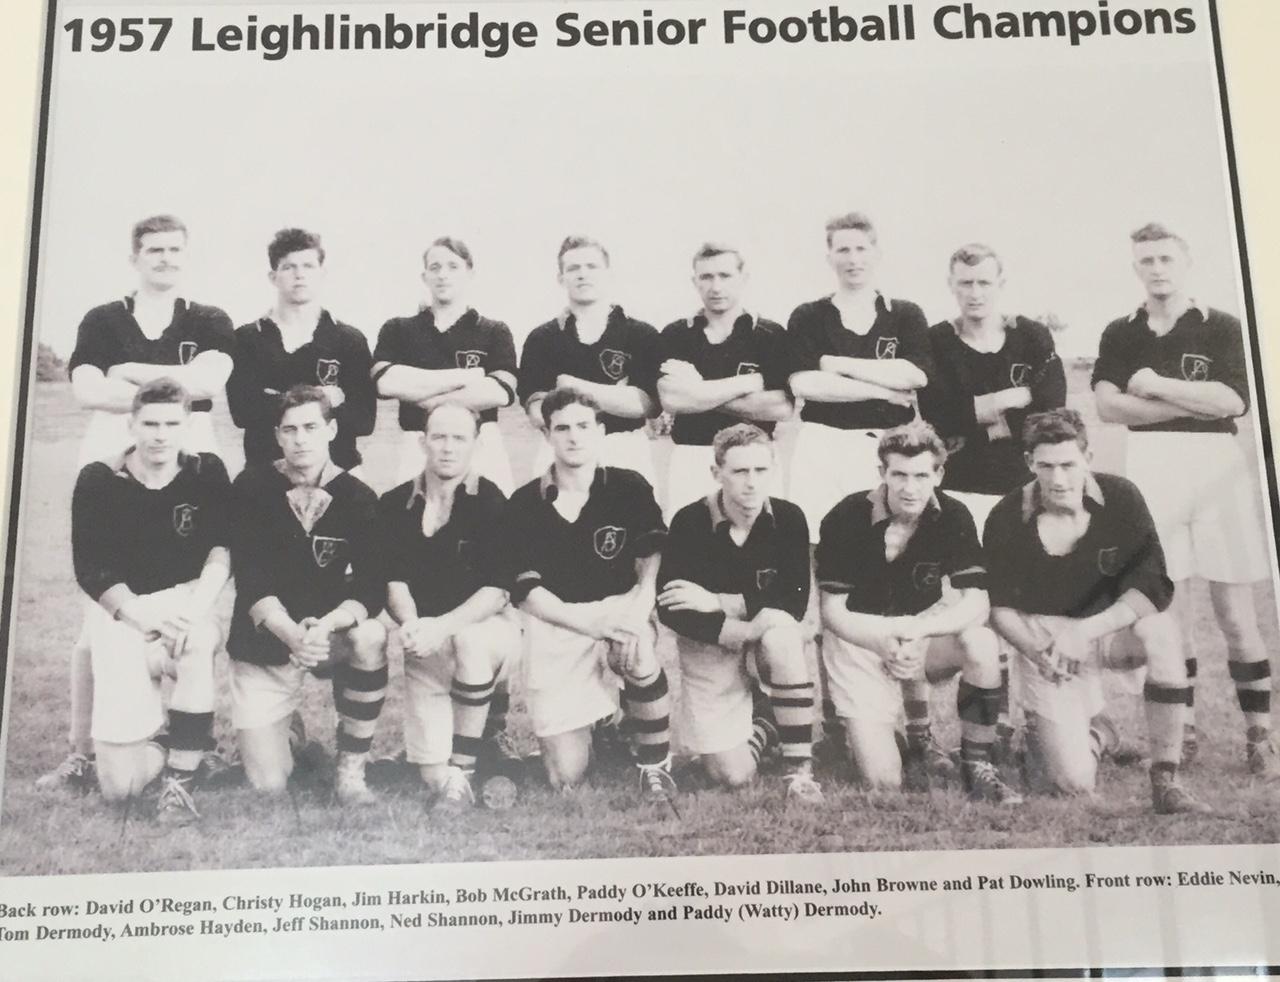 1957 Leighlinbridge